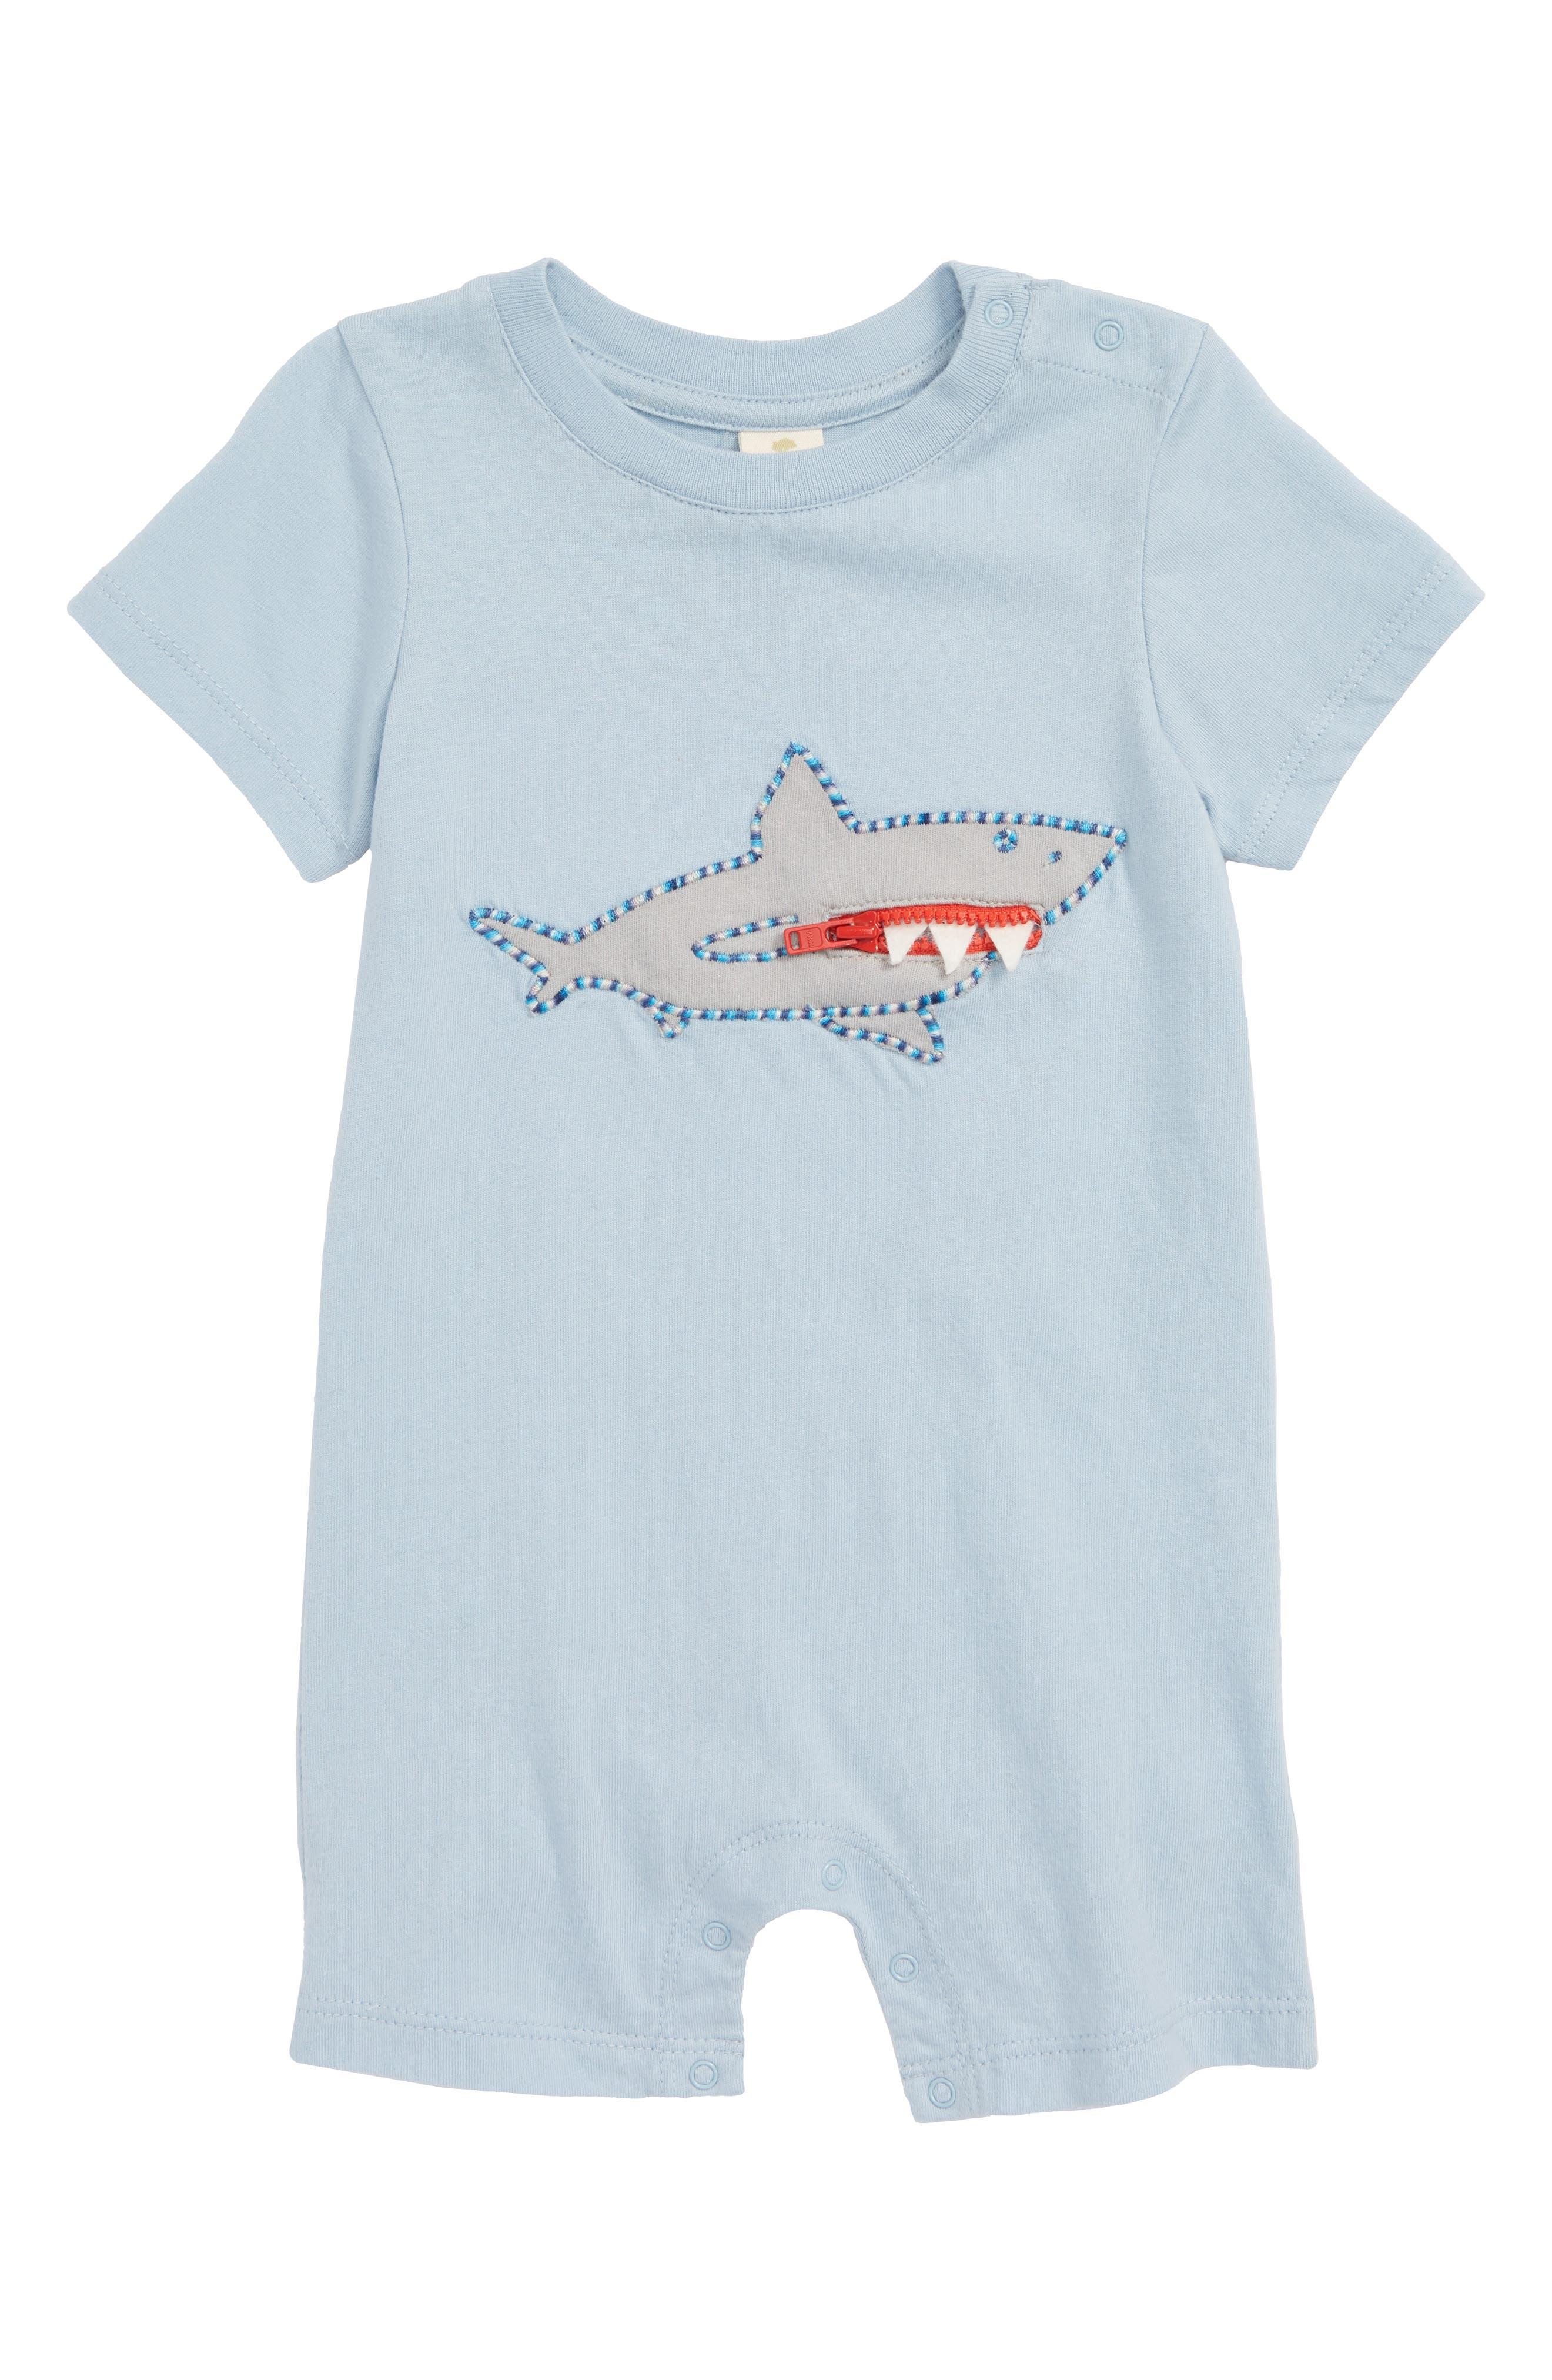 Tucker + Tate Shark Zip Mouth Romper (Baby)